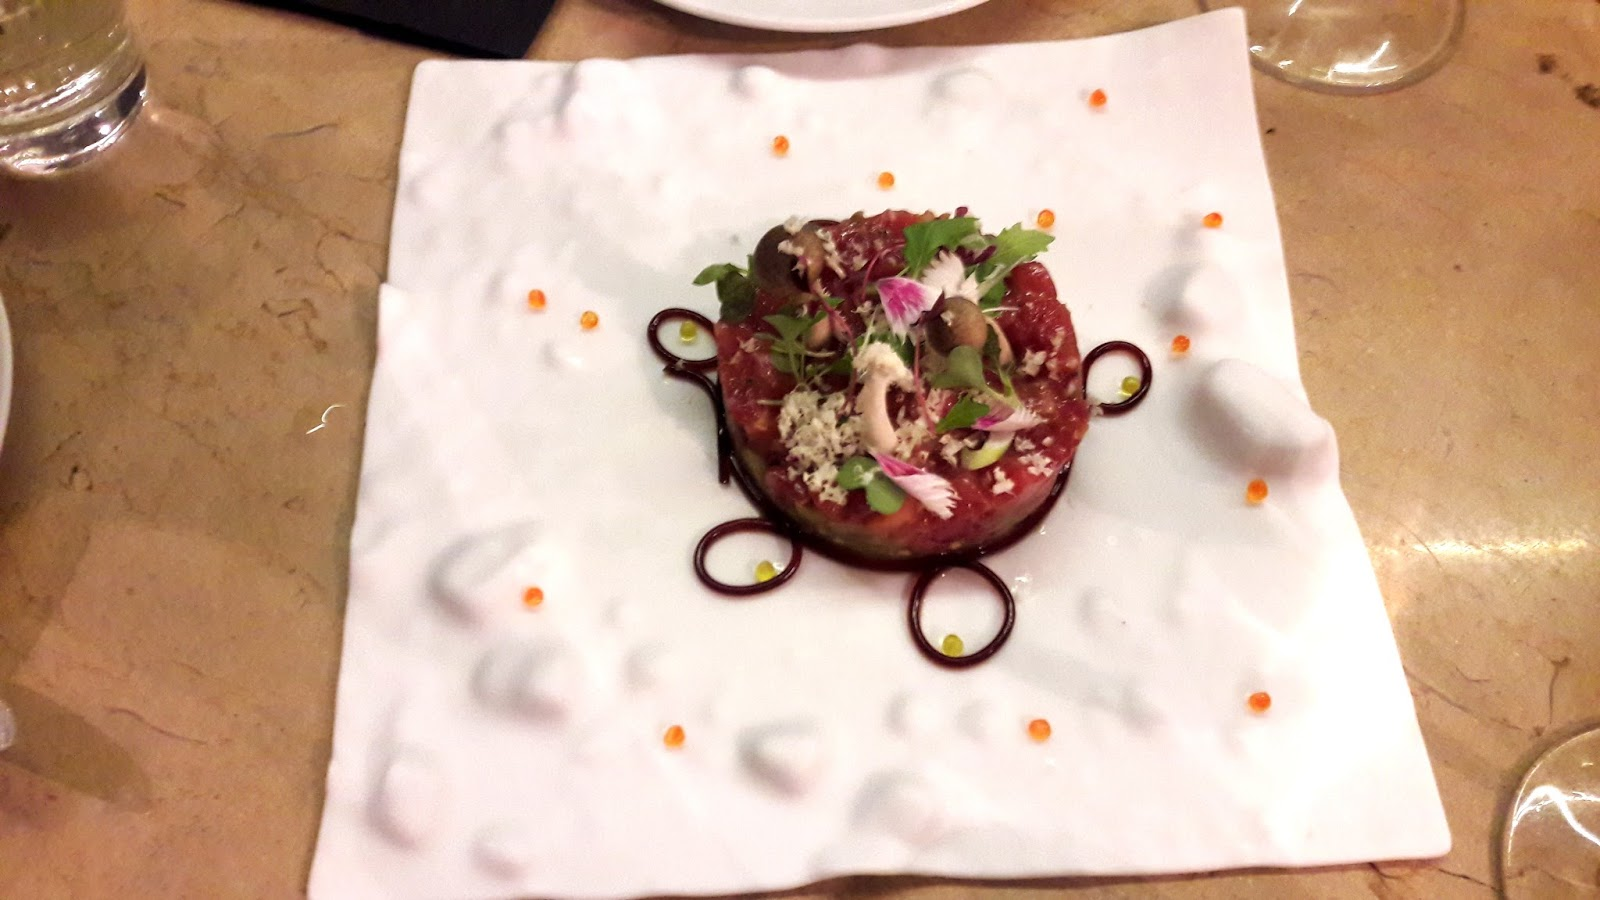 20160901 212344 - Mont Bar - 西班牙巴塞隆納的創意『分子料理』,藏在平凡的小酒吧裡!